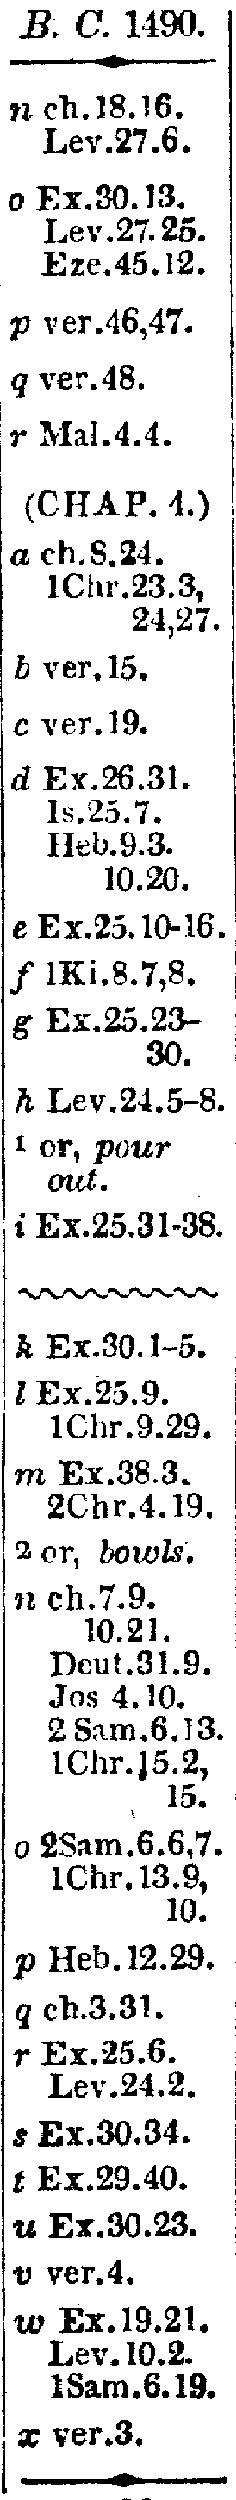 [ocr errors][merged small][ocr errors][ocr errors][merged small][merged small][merged small][ocr errors][ocr errors][ocr errors][merged small][ocr errors][ocr errors][ocr errors][ocr errors][ocr errors][ocr errors][merged small][ocr errors][merged small][merged small]